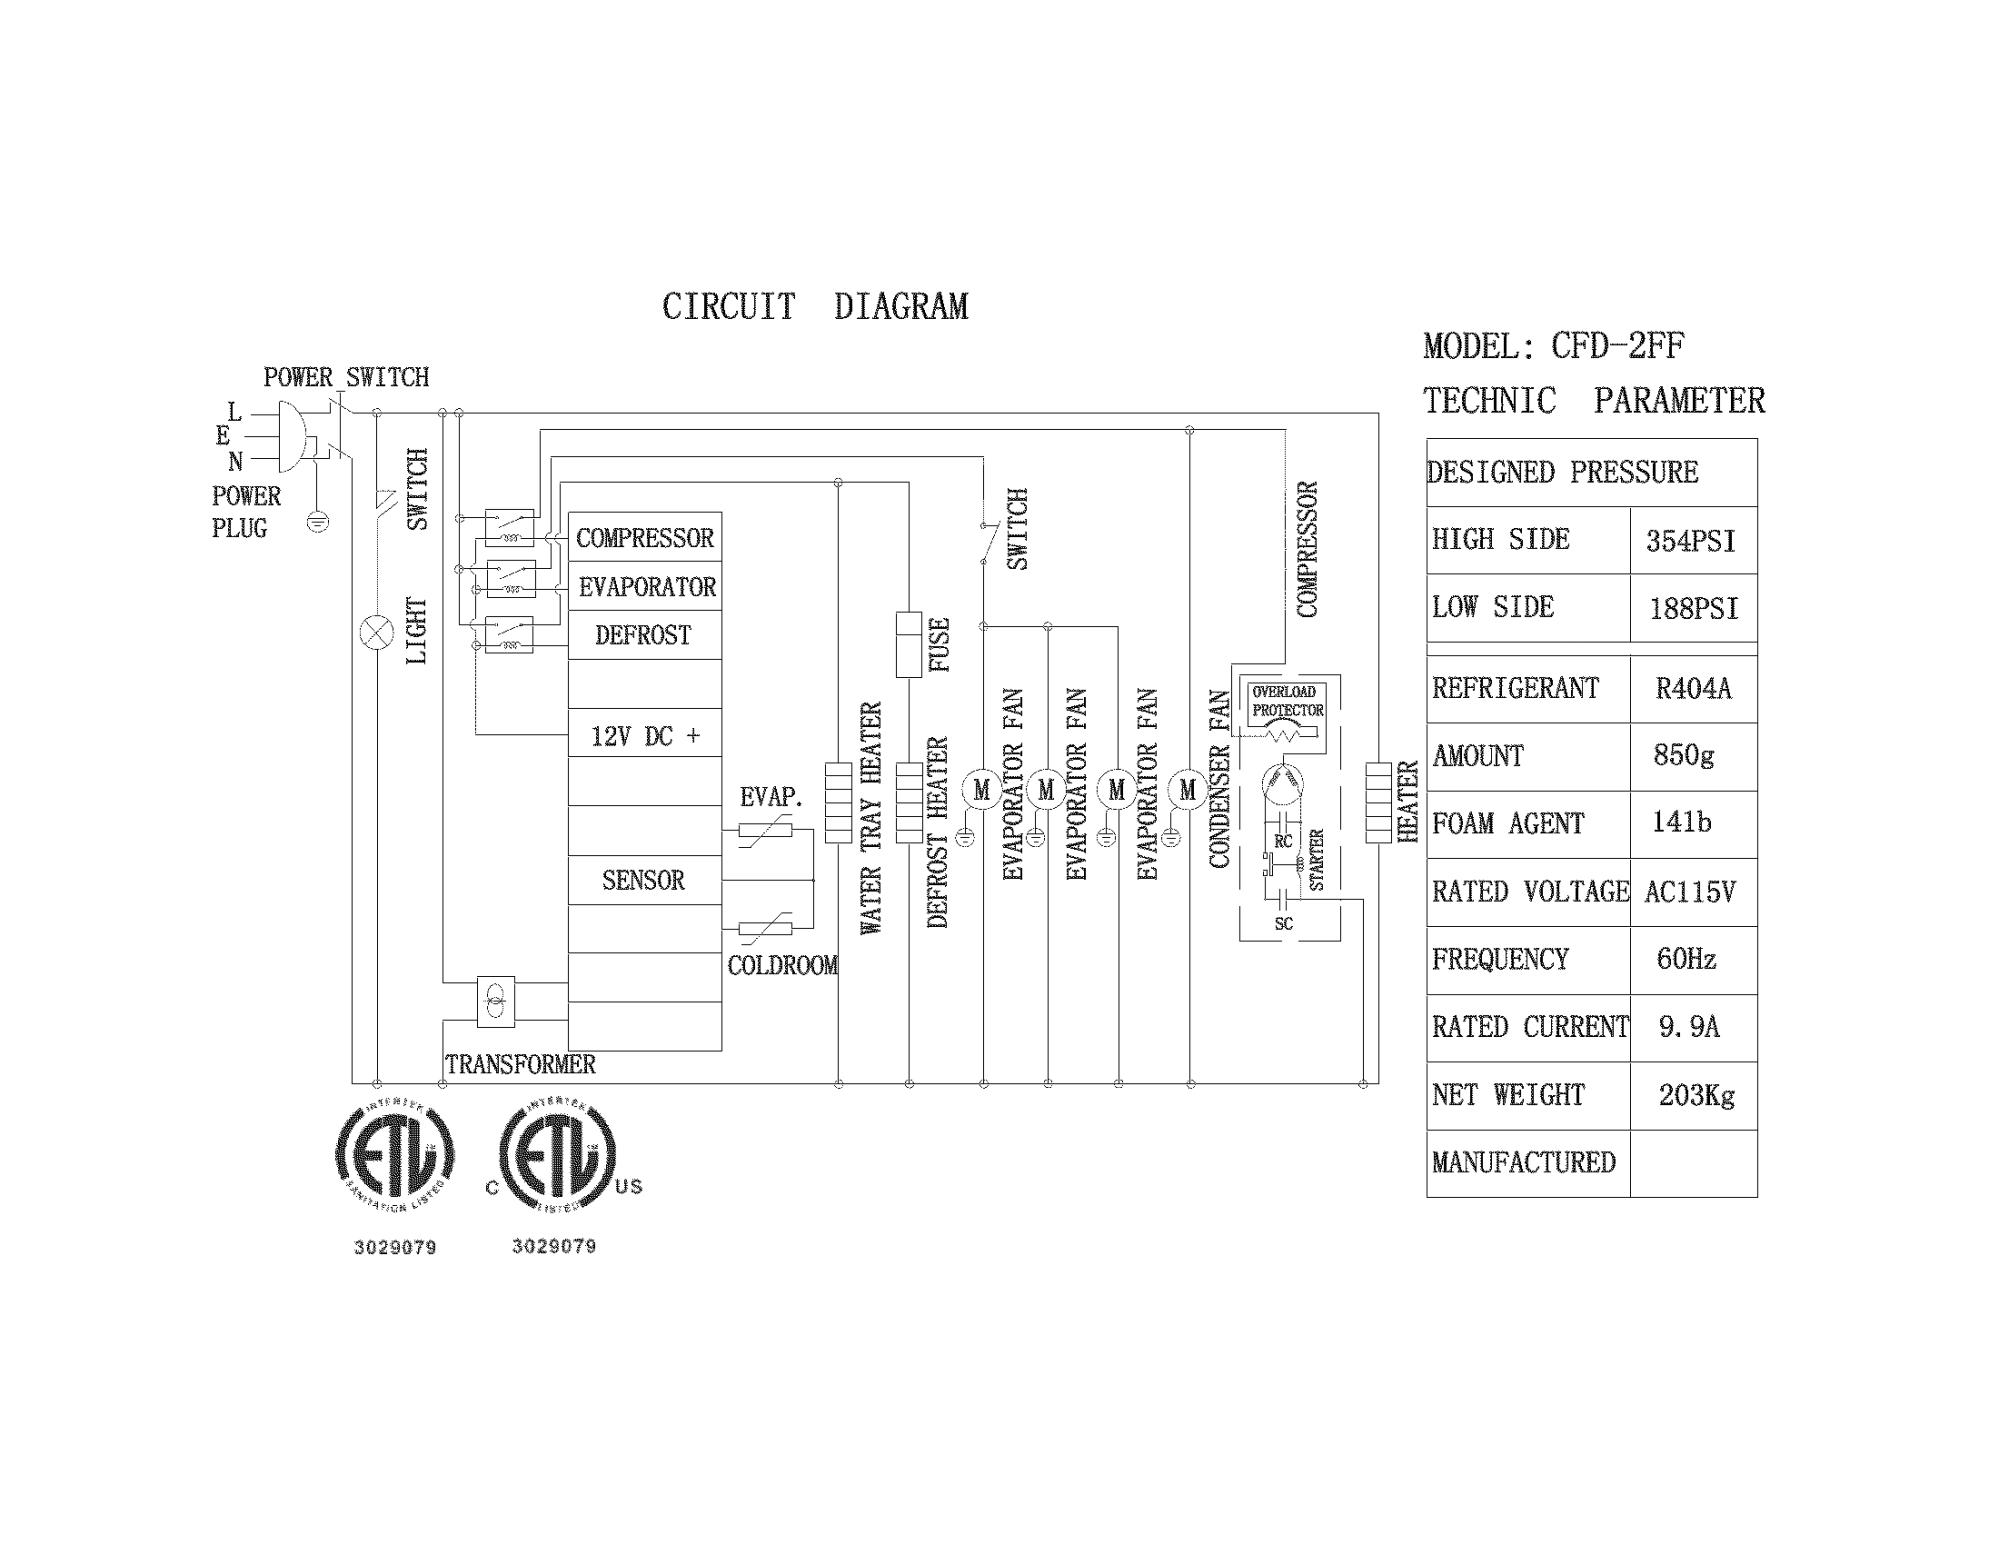 hight resolution of kelvinator model kcbm48f refrigeration commercial genuine parts diagram range circuit ge schematic js998